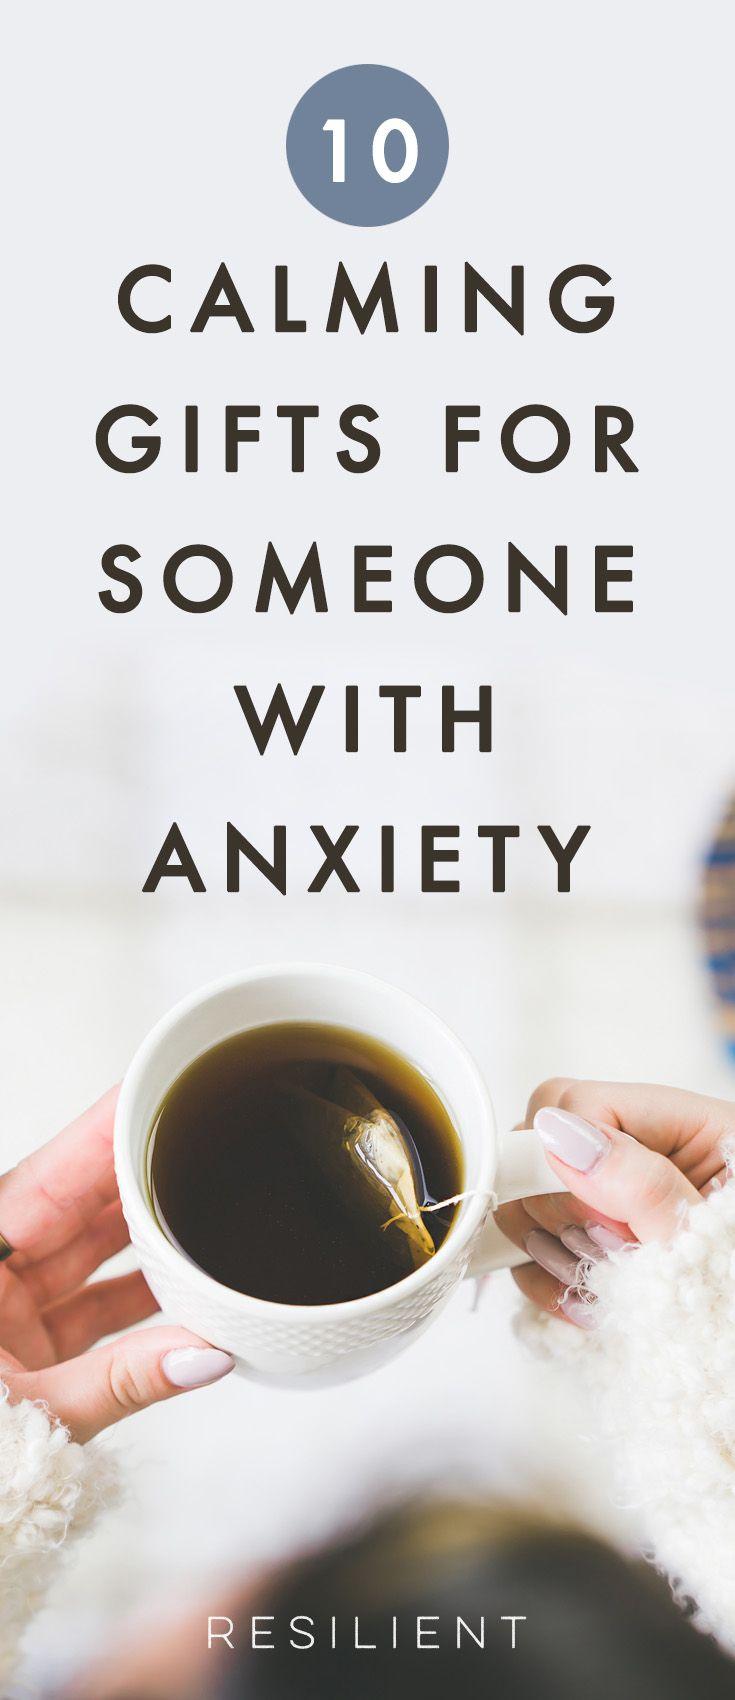 7487 Best Mind Feelings Motivation Images On Pinterest